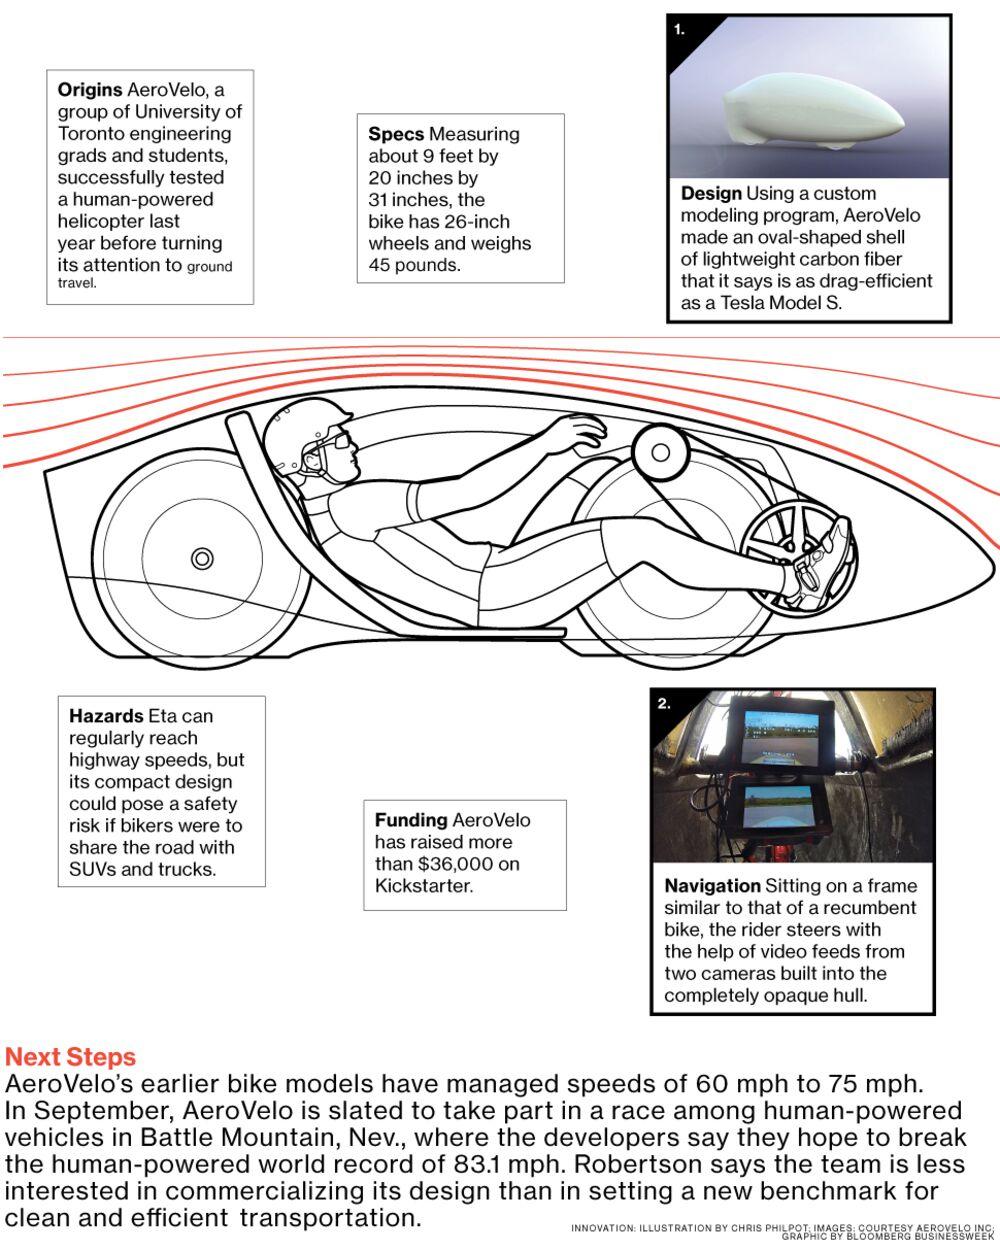 Eta Speedbike Can Travel at Highway Speeds - Bloomberg